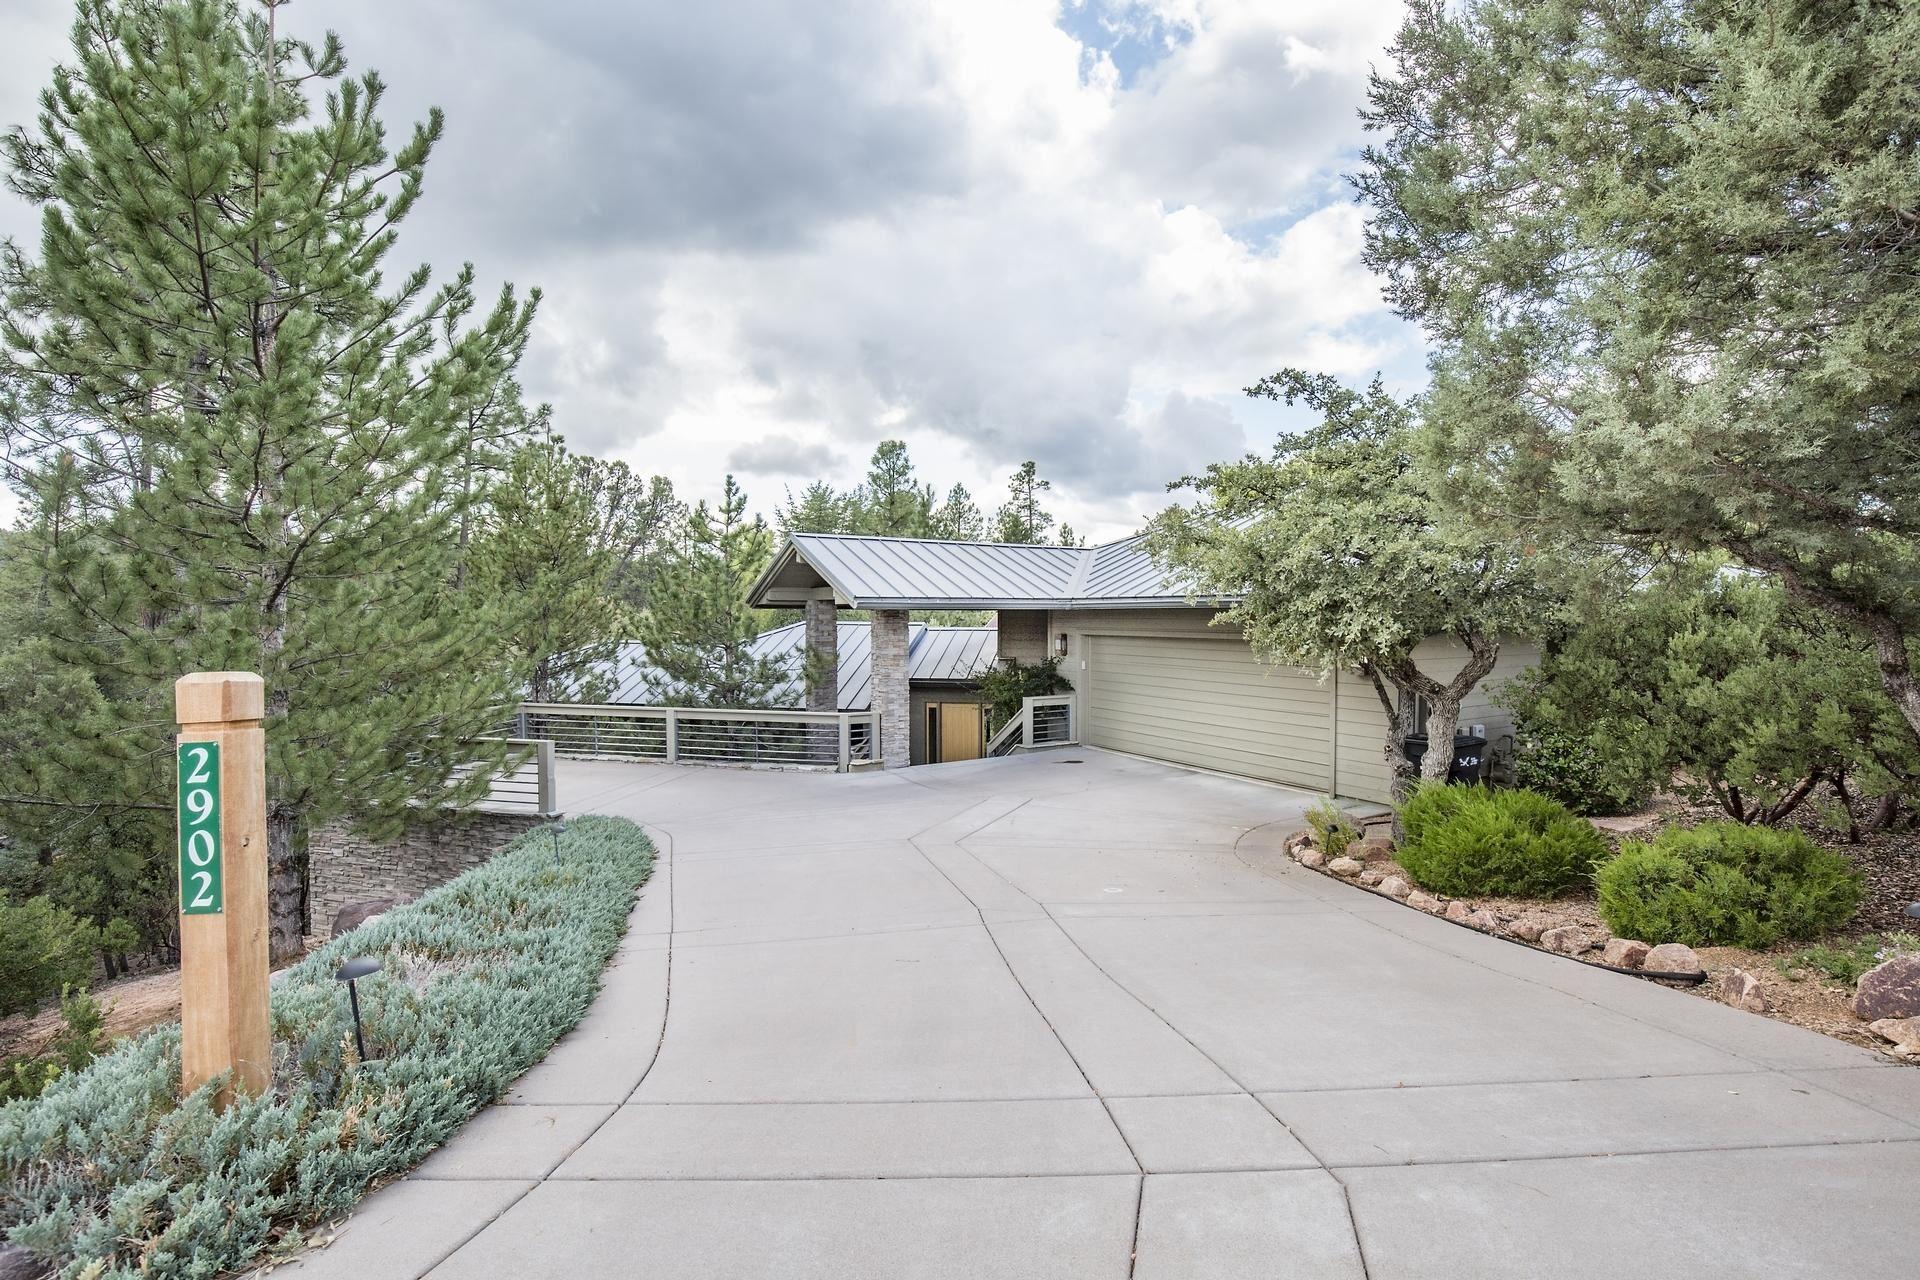 Photo of 2902 E Rim Club Drive, Payson, AZ 85541 (MLS # 81378)